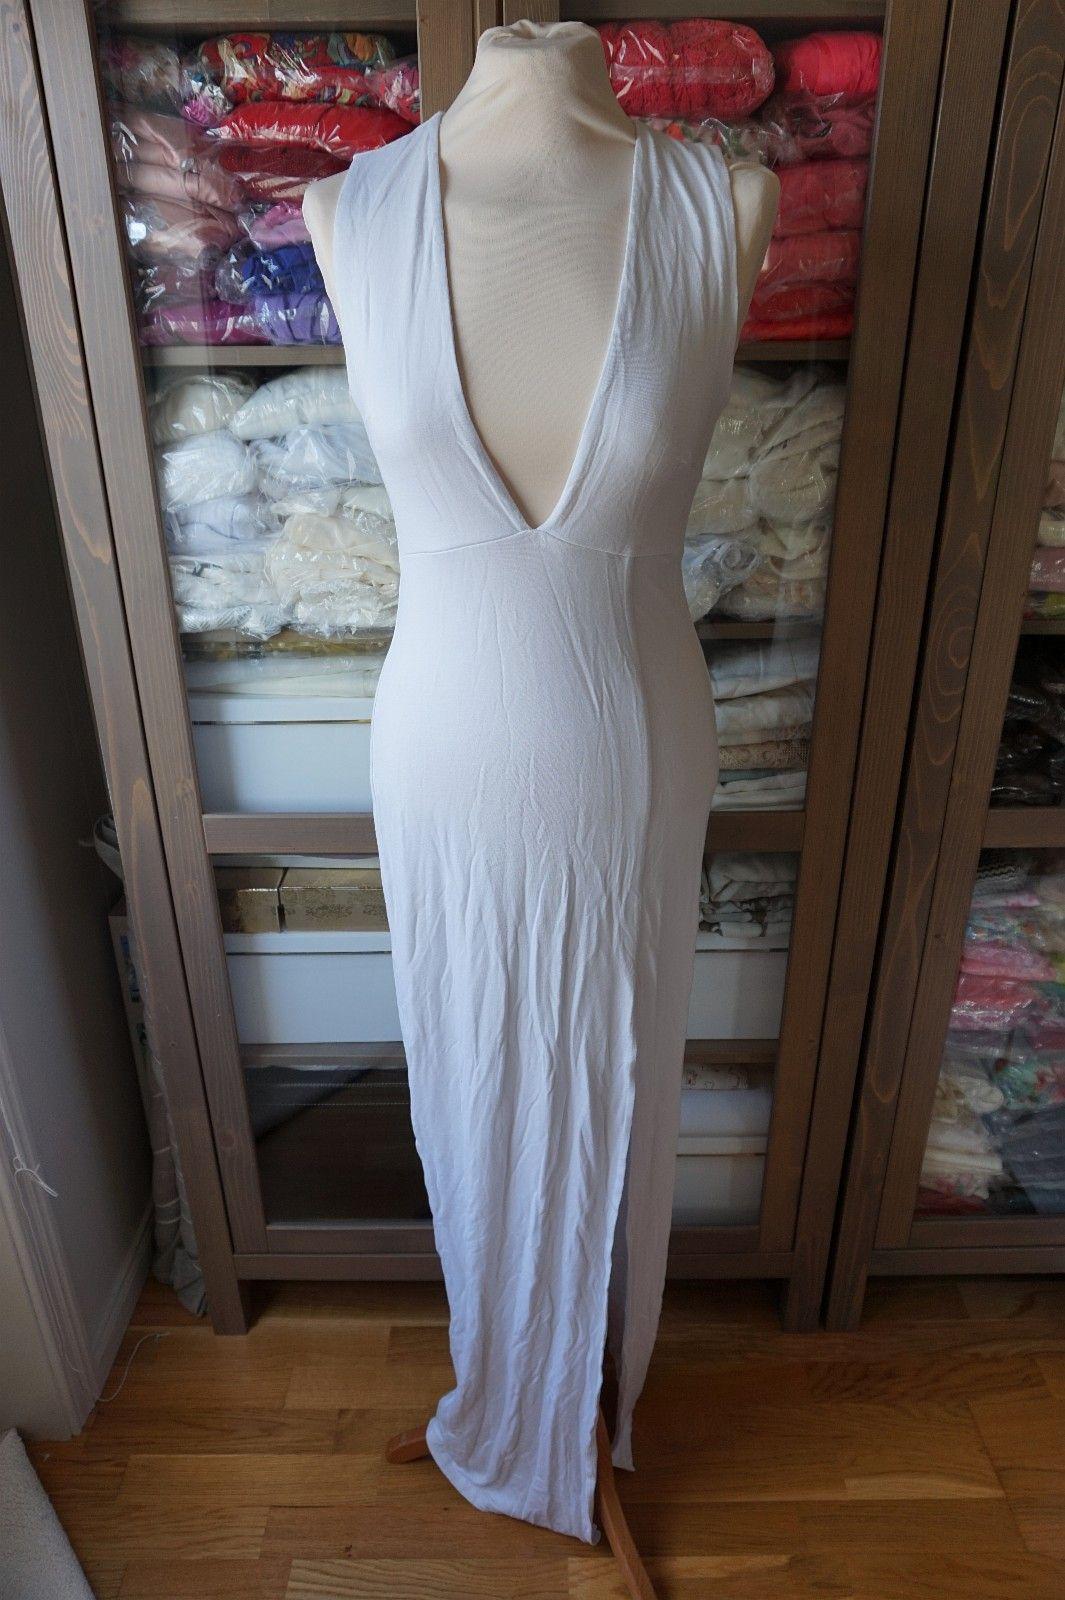 1f57bc90 Hvit kjole, dyp utringning, str 38, ubrukt | FINN.no